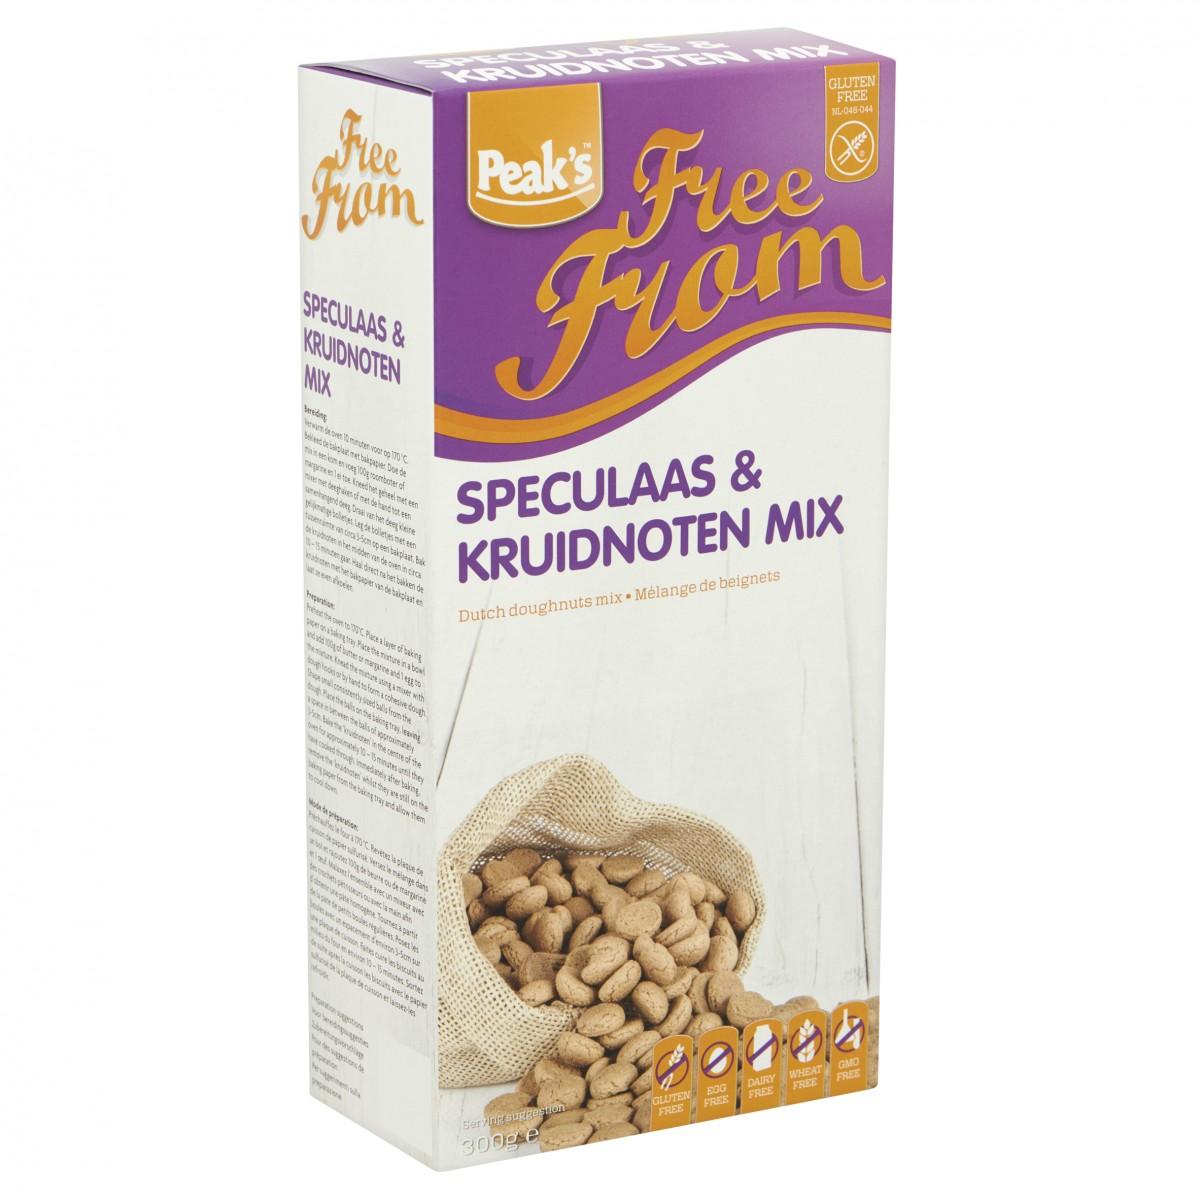 Speculaas & Kruidnoten Mix